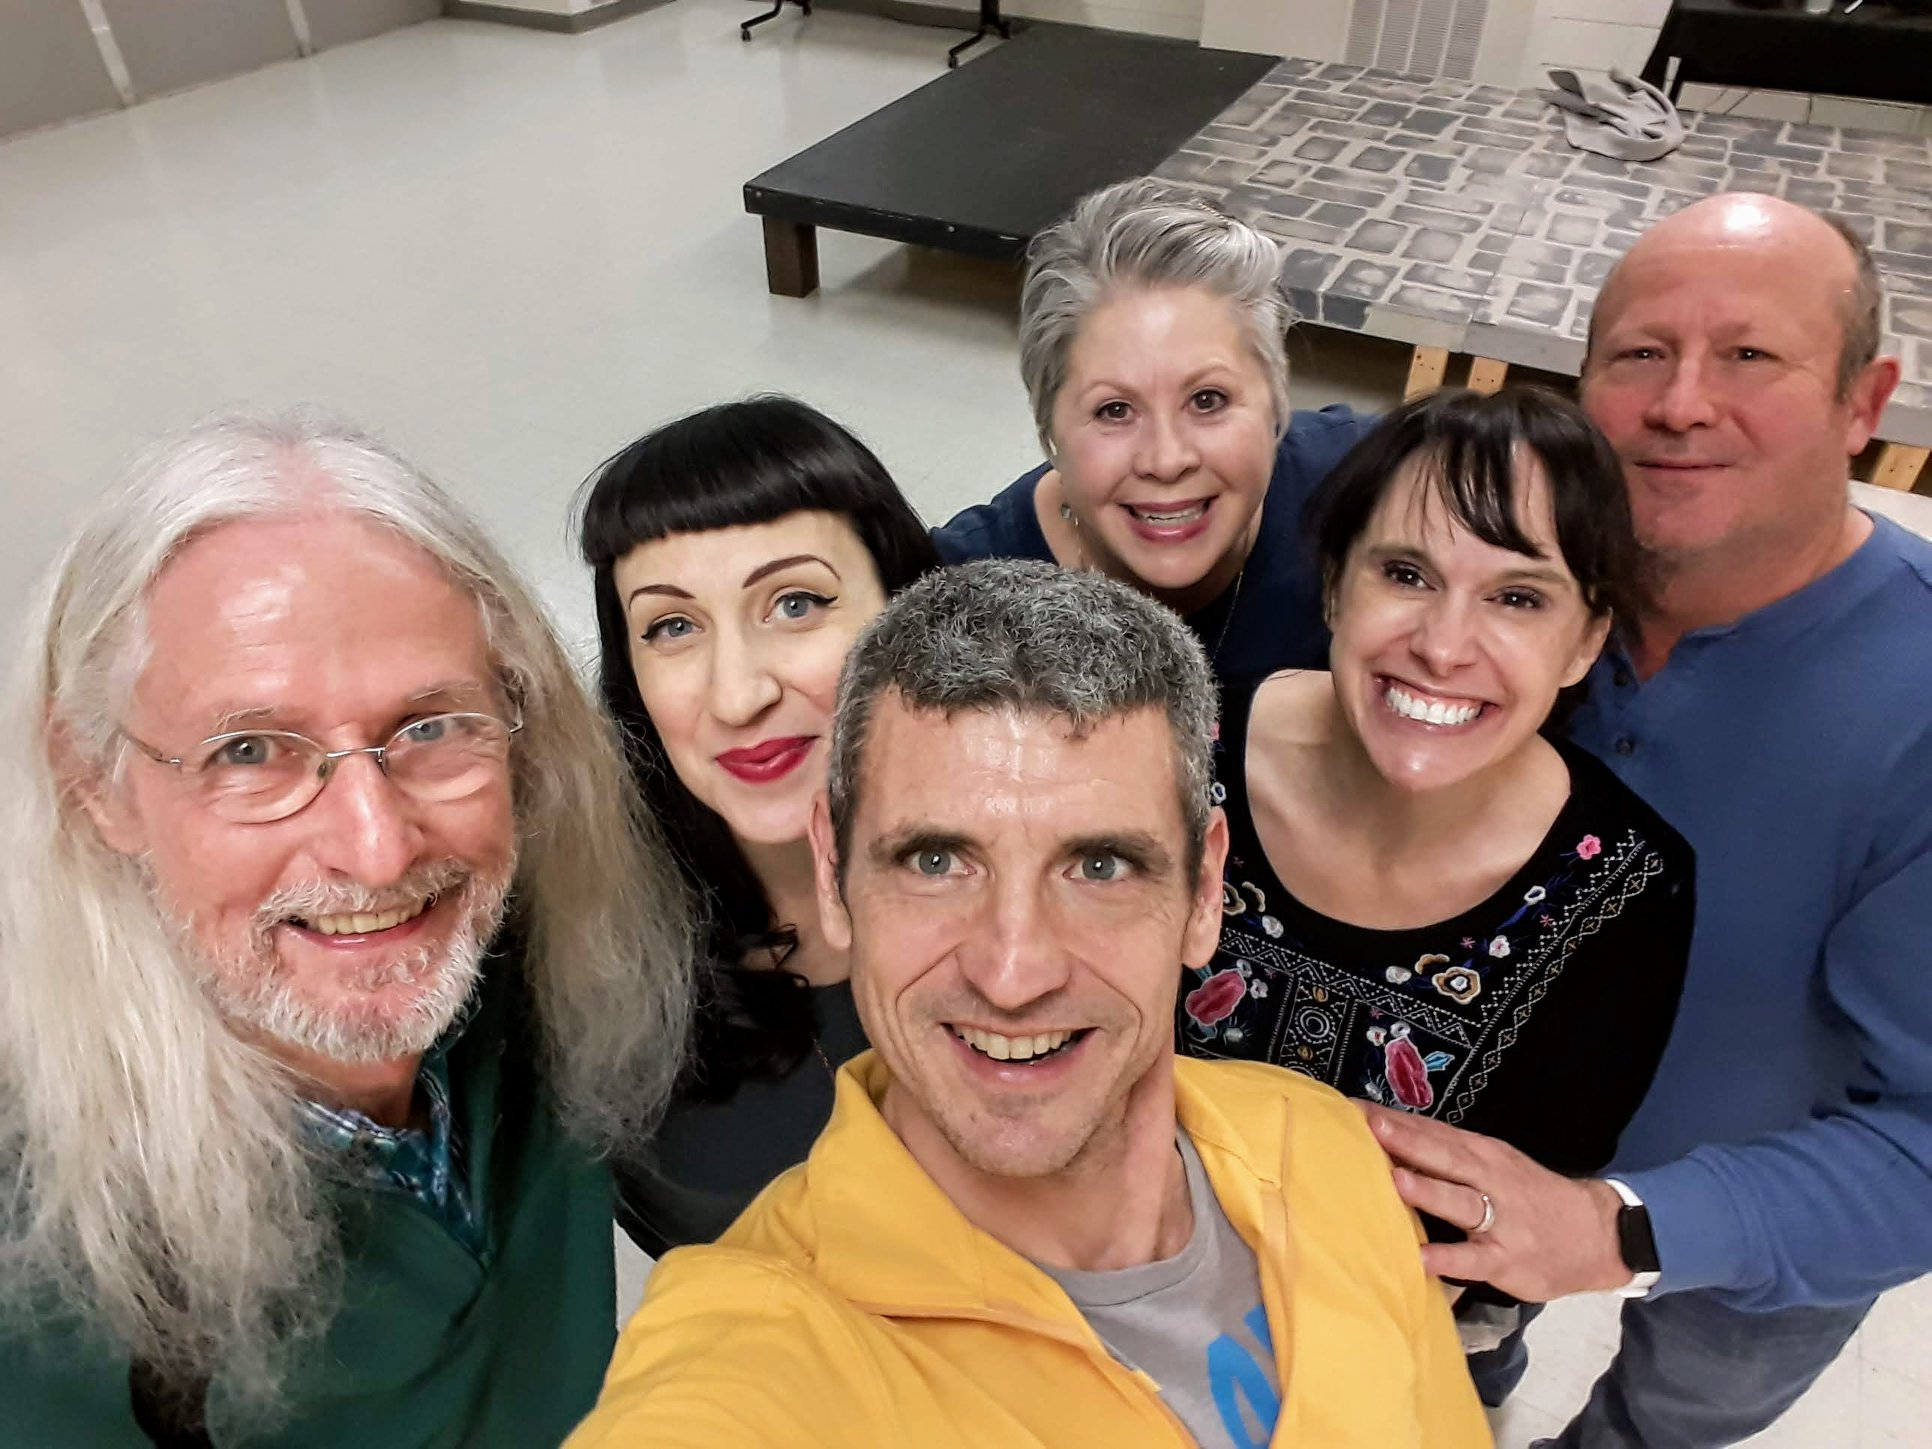 Six adults taking a selfie